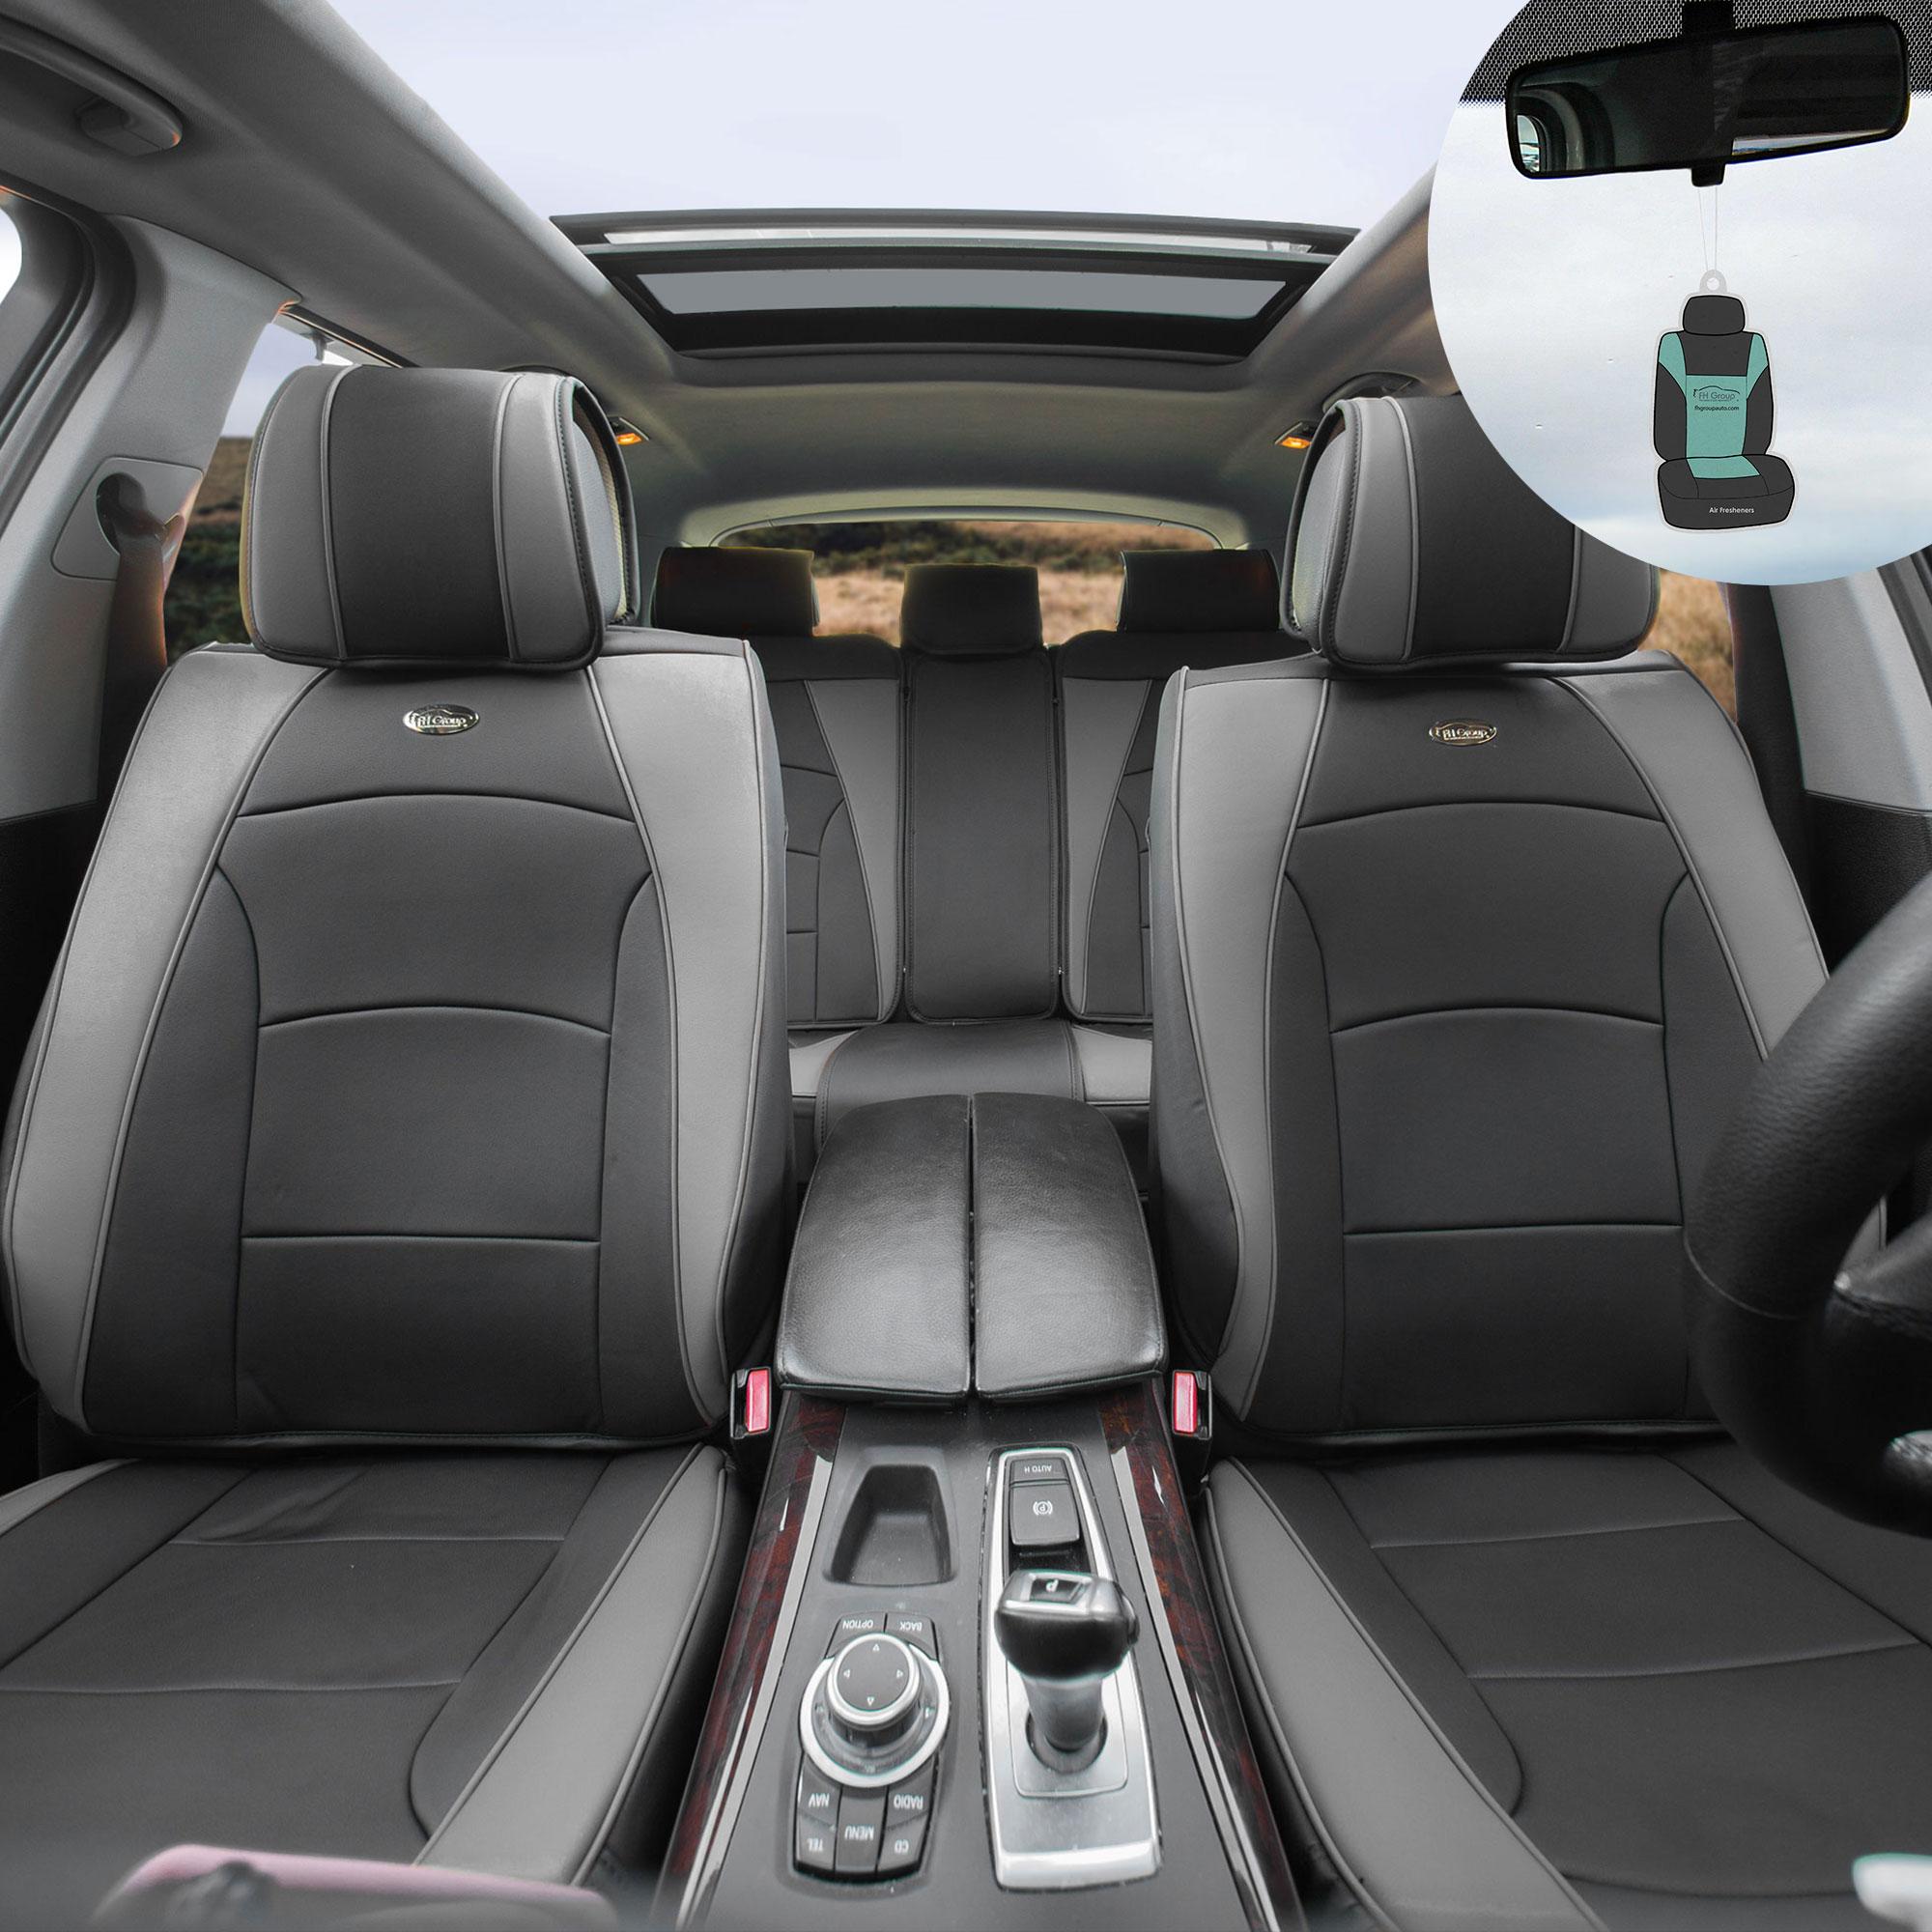 Full Set Chevrolet Orlando Luxury GREY//BLACK Leather Look Car Seat Covers